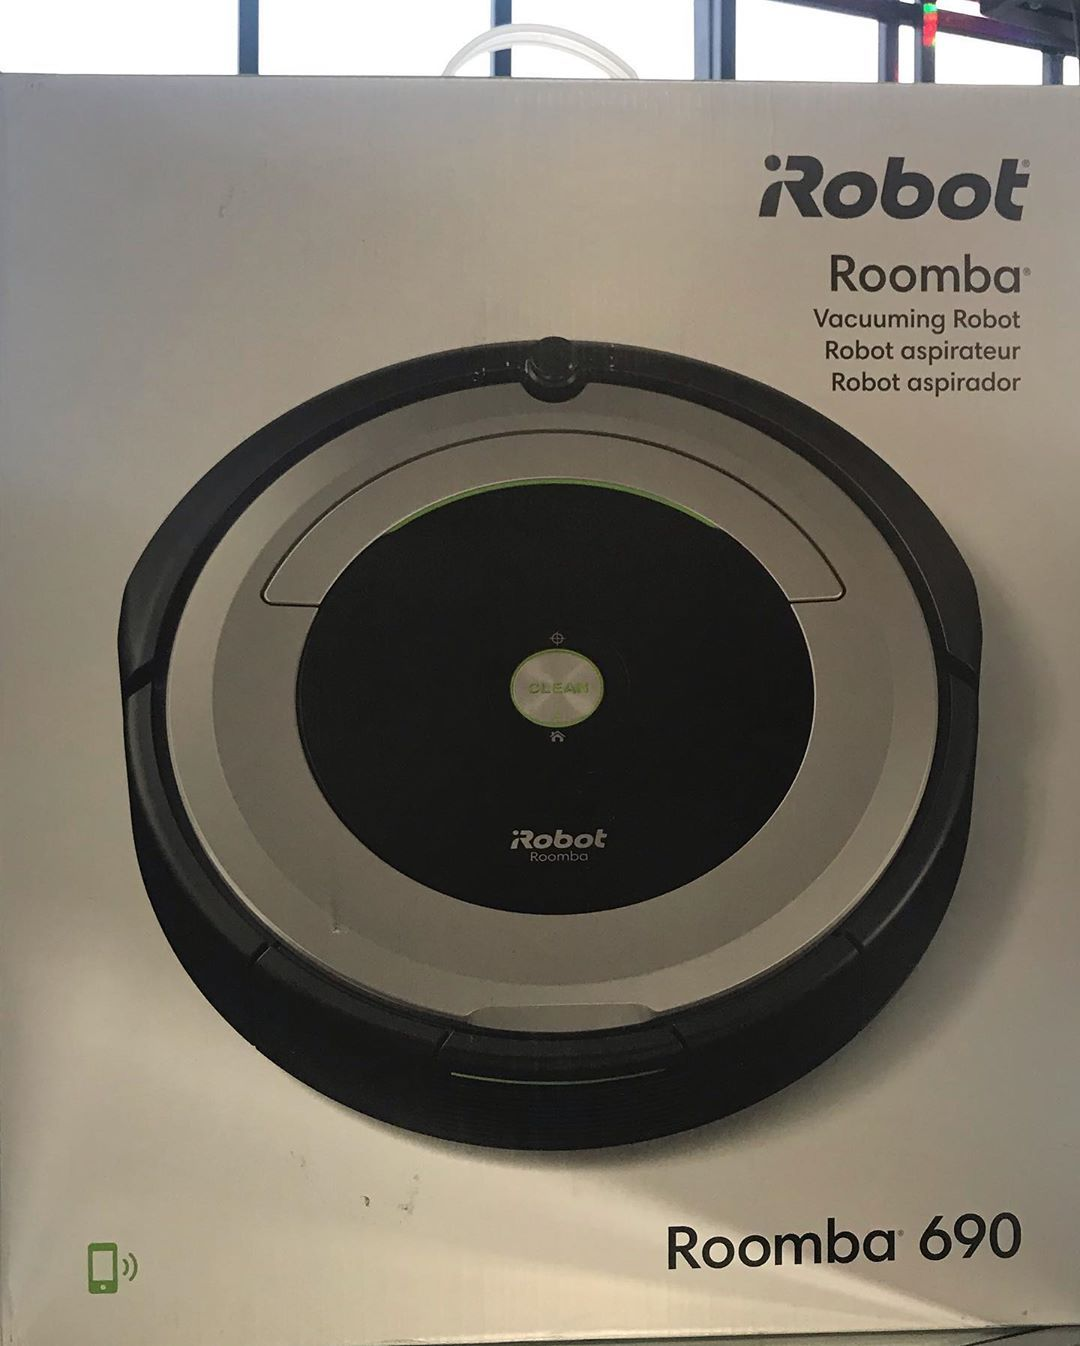 iRobot Roomba 690 vacuumwifi connectivity works with